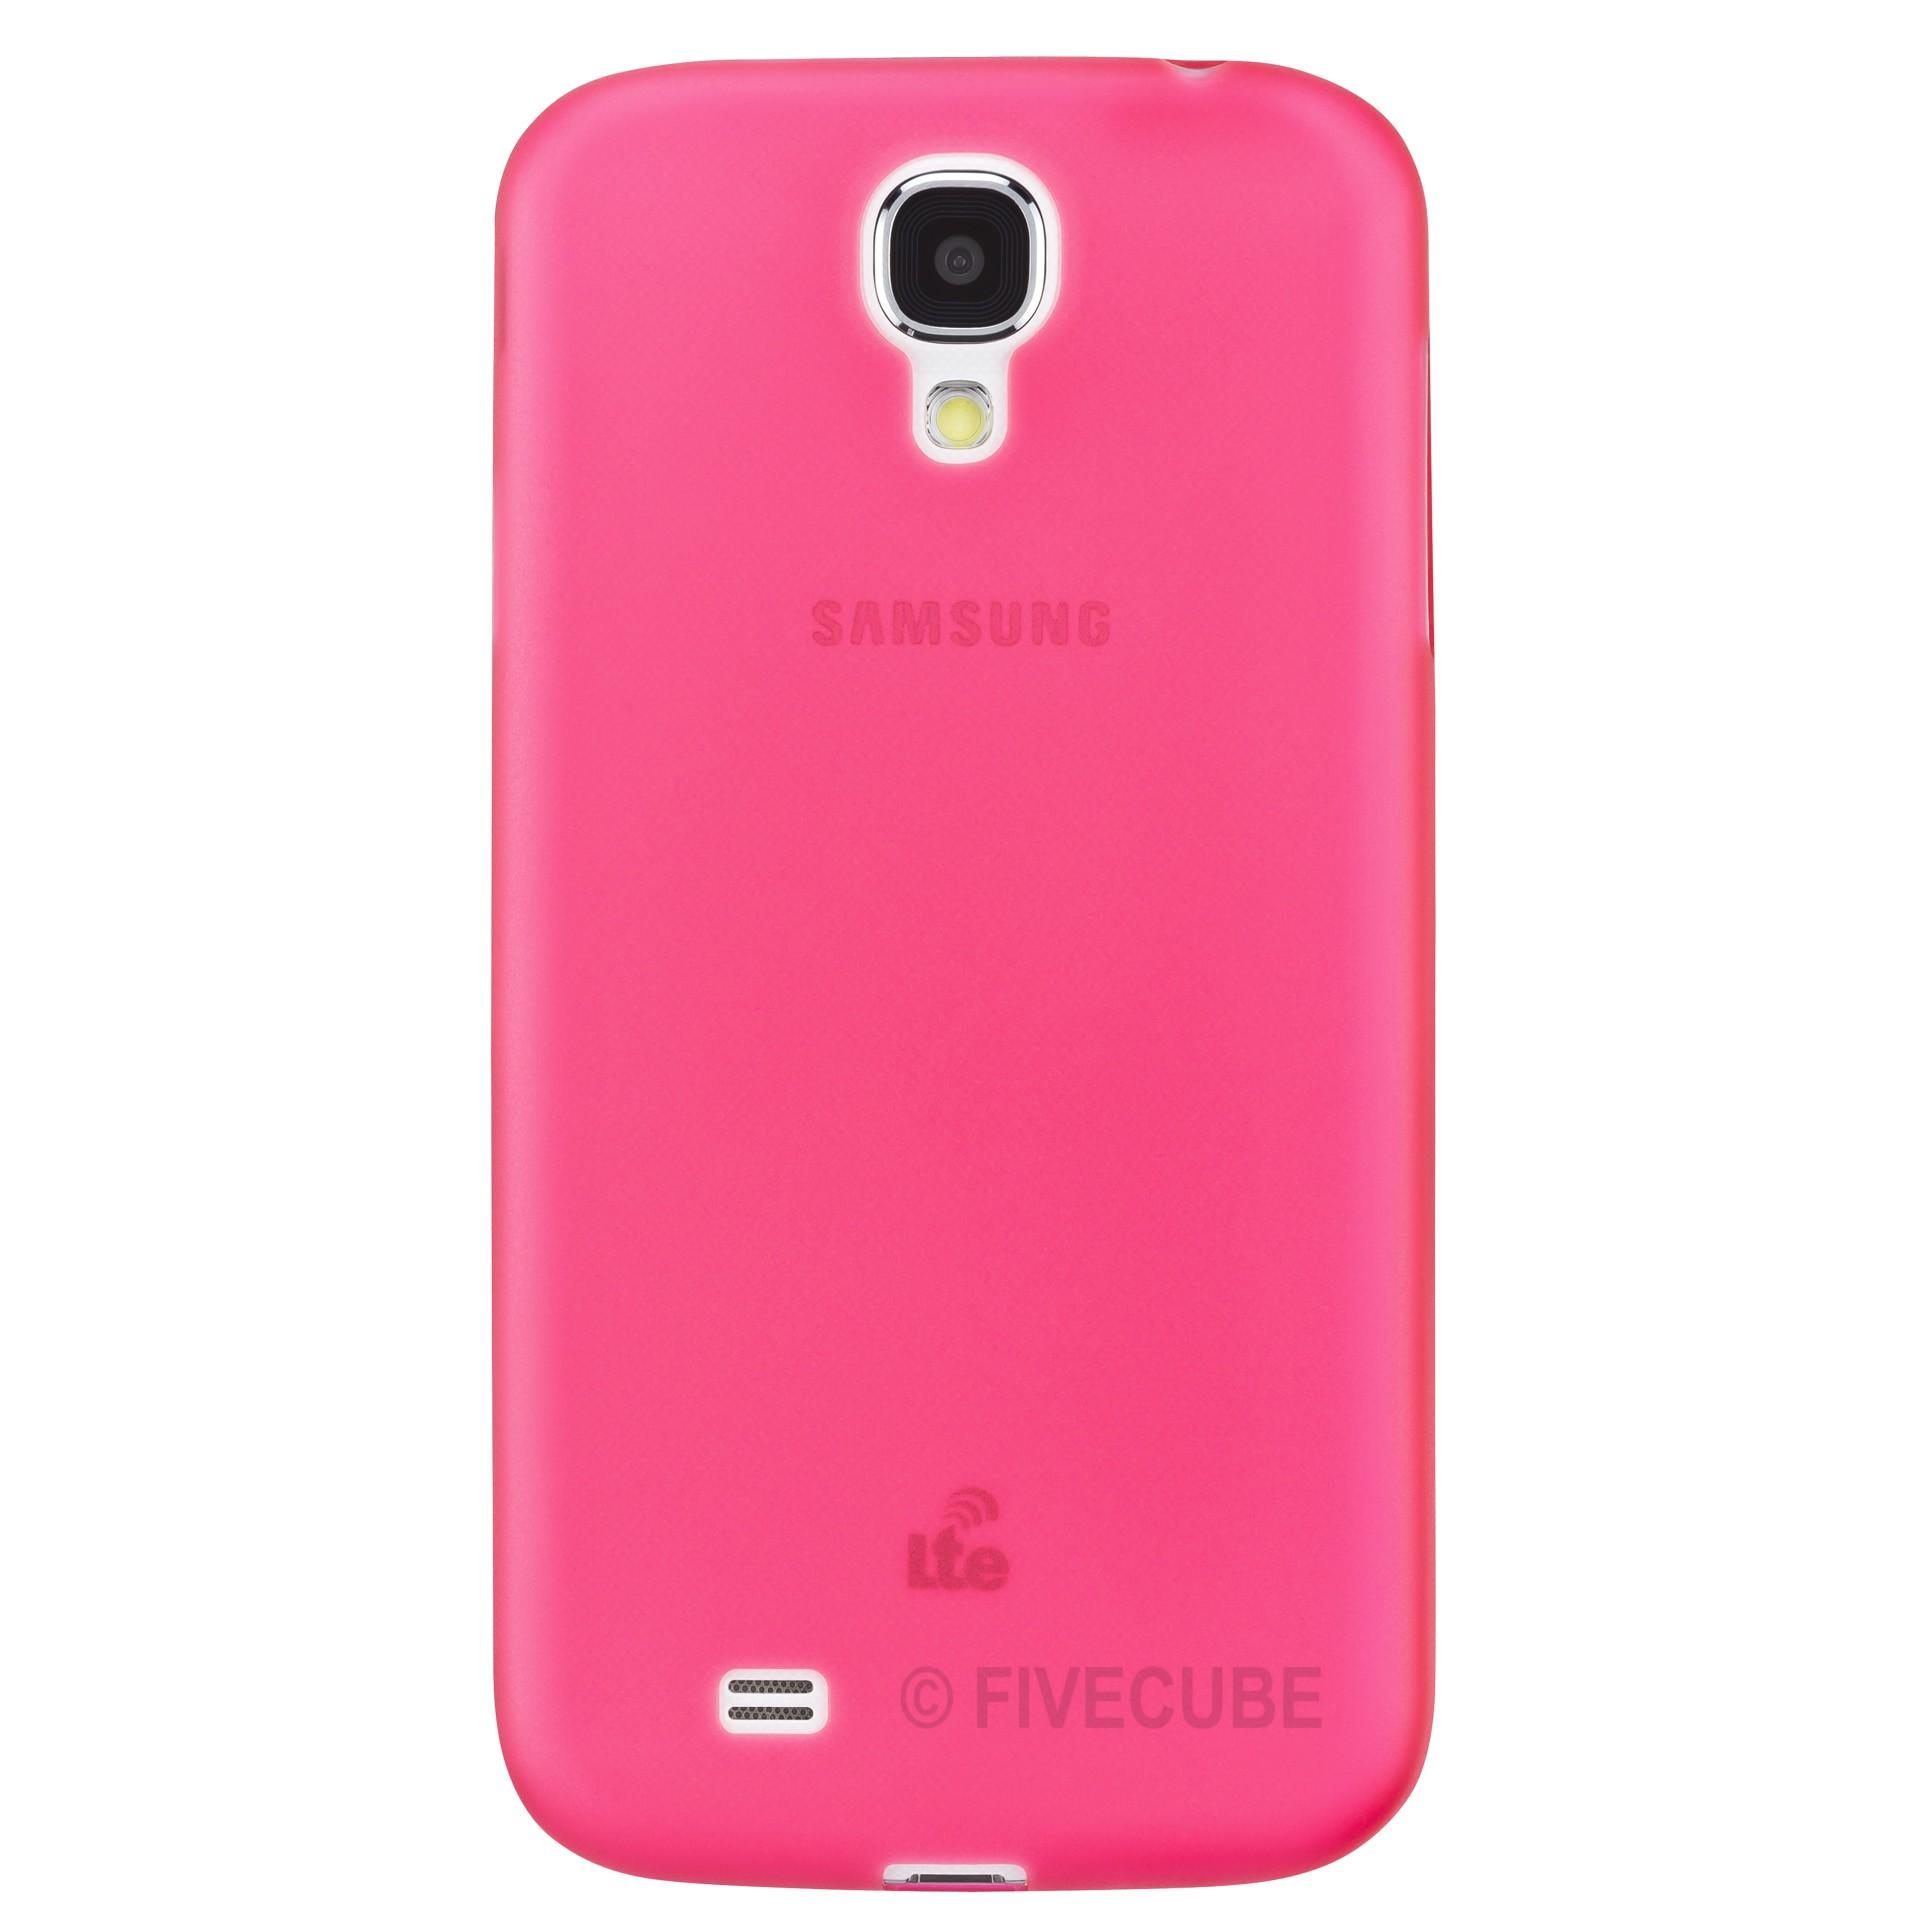 Yemota Pro Slimcase für Samsung Galaxy S4 mini - Rot